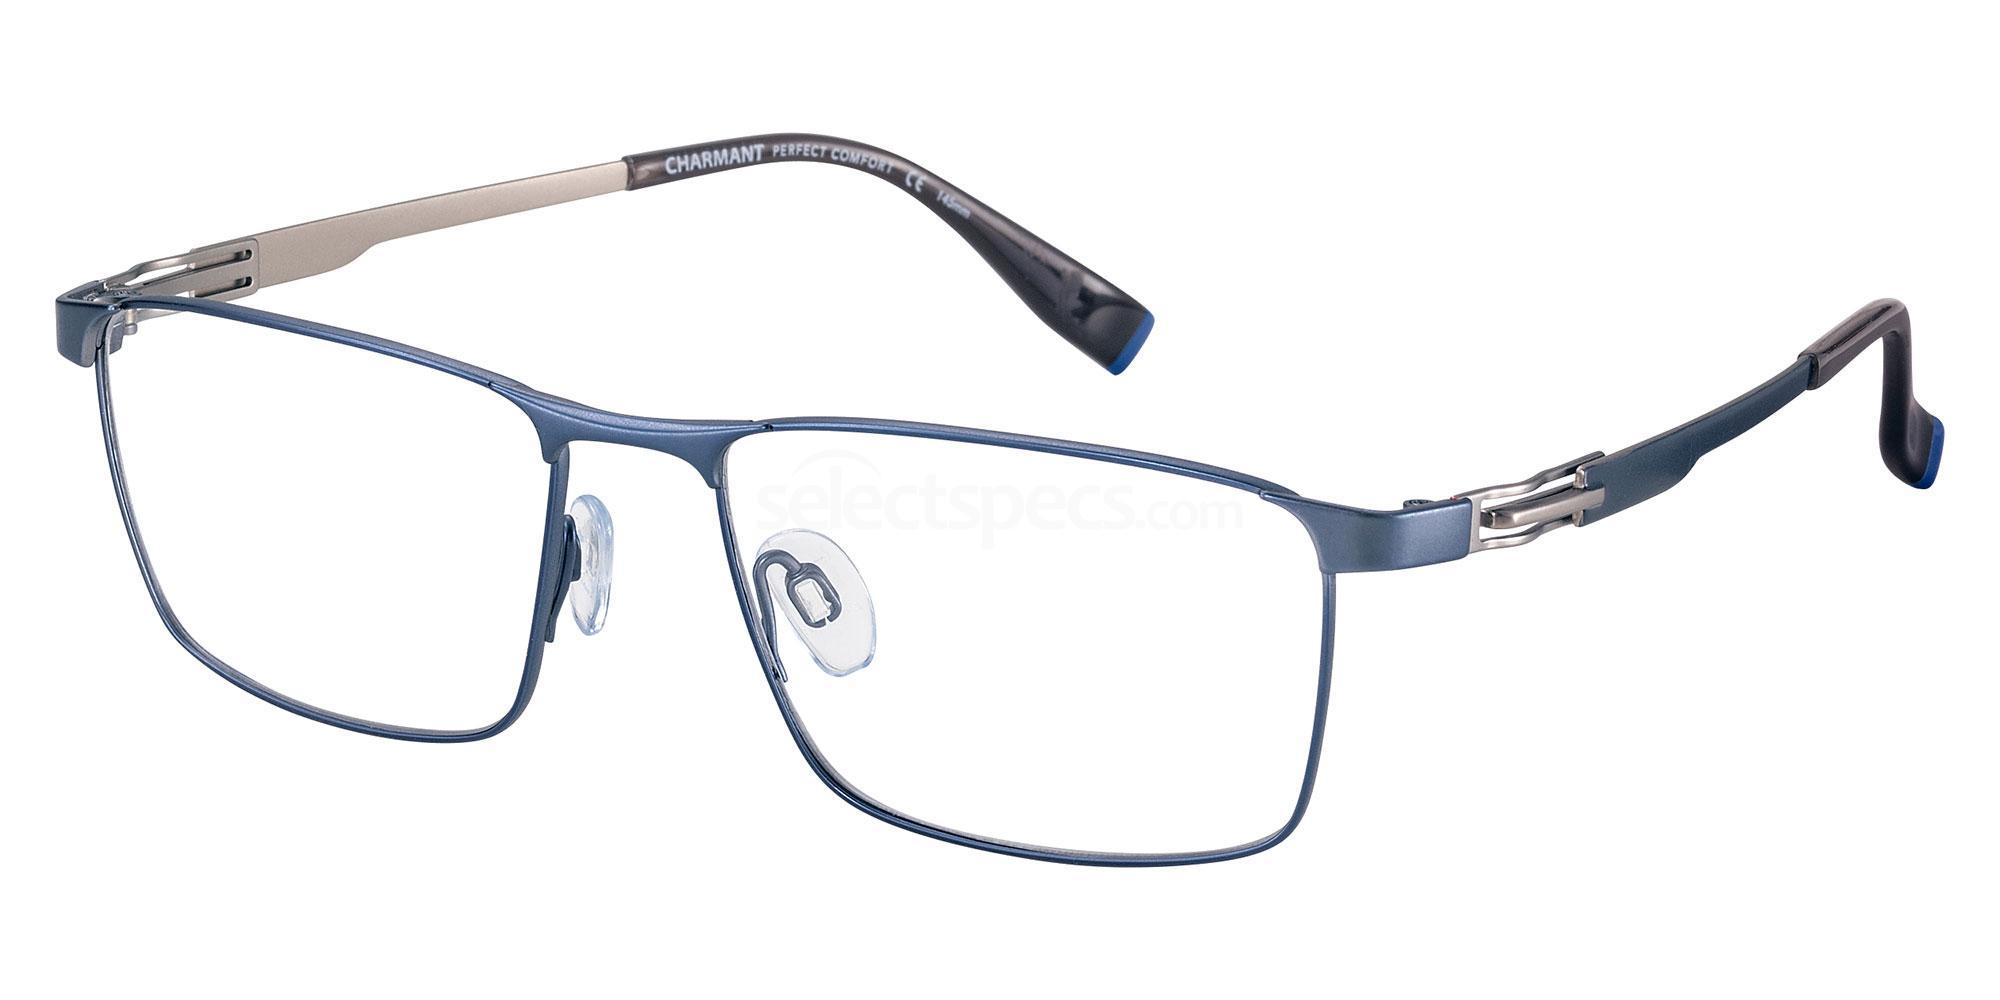 BL CH12340 Glasses, Charmant Perfect Comfort